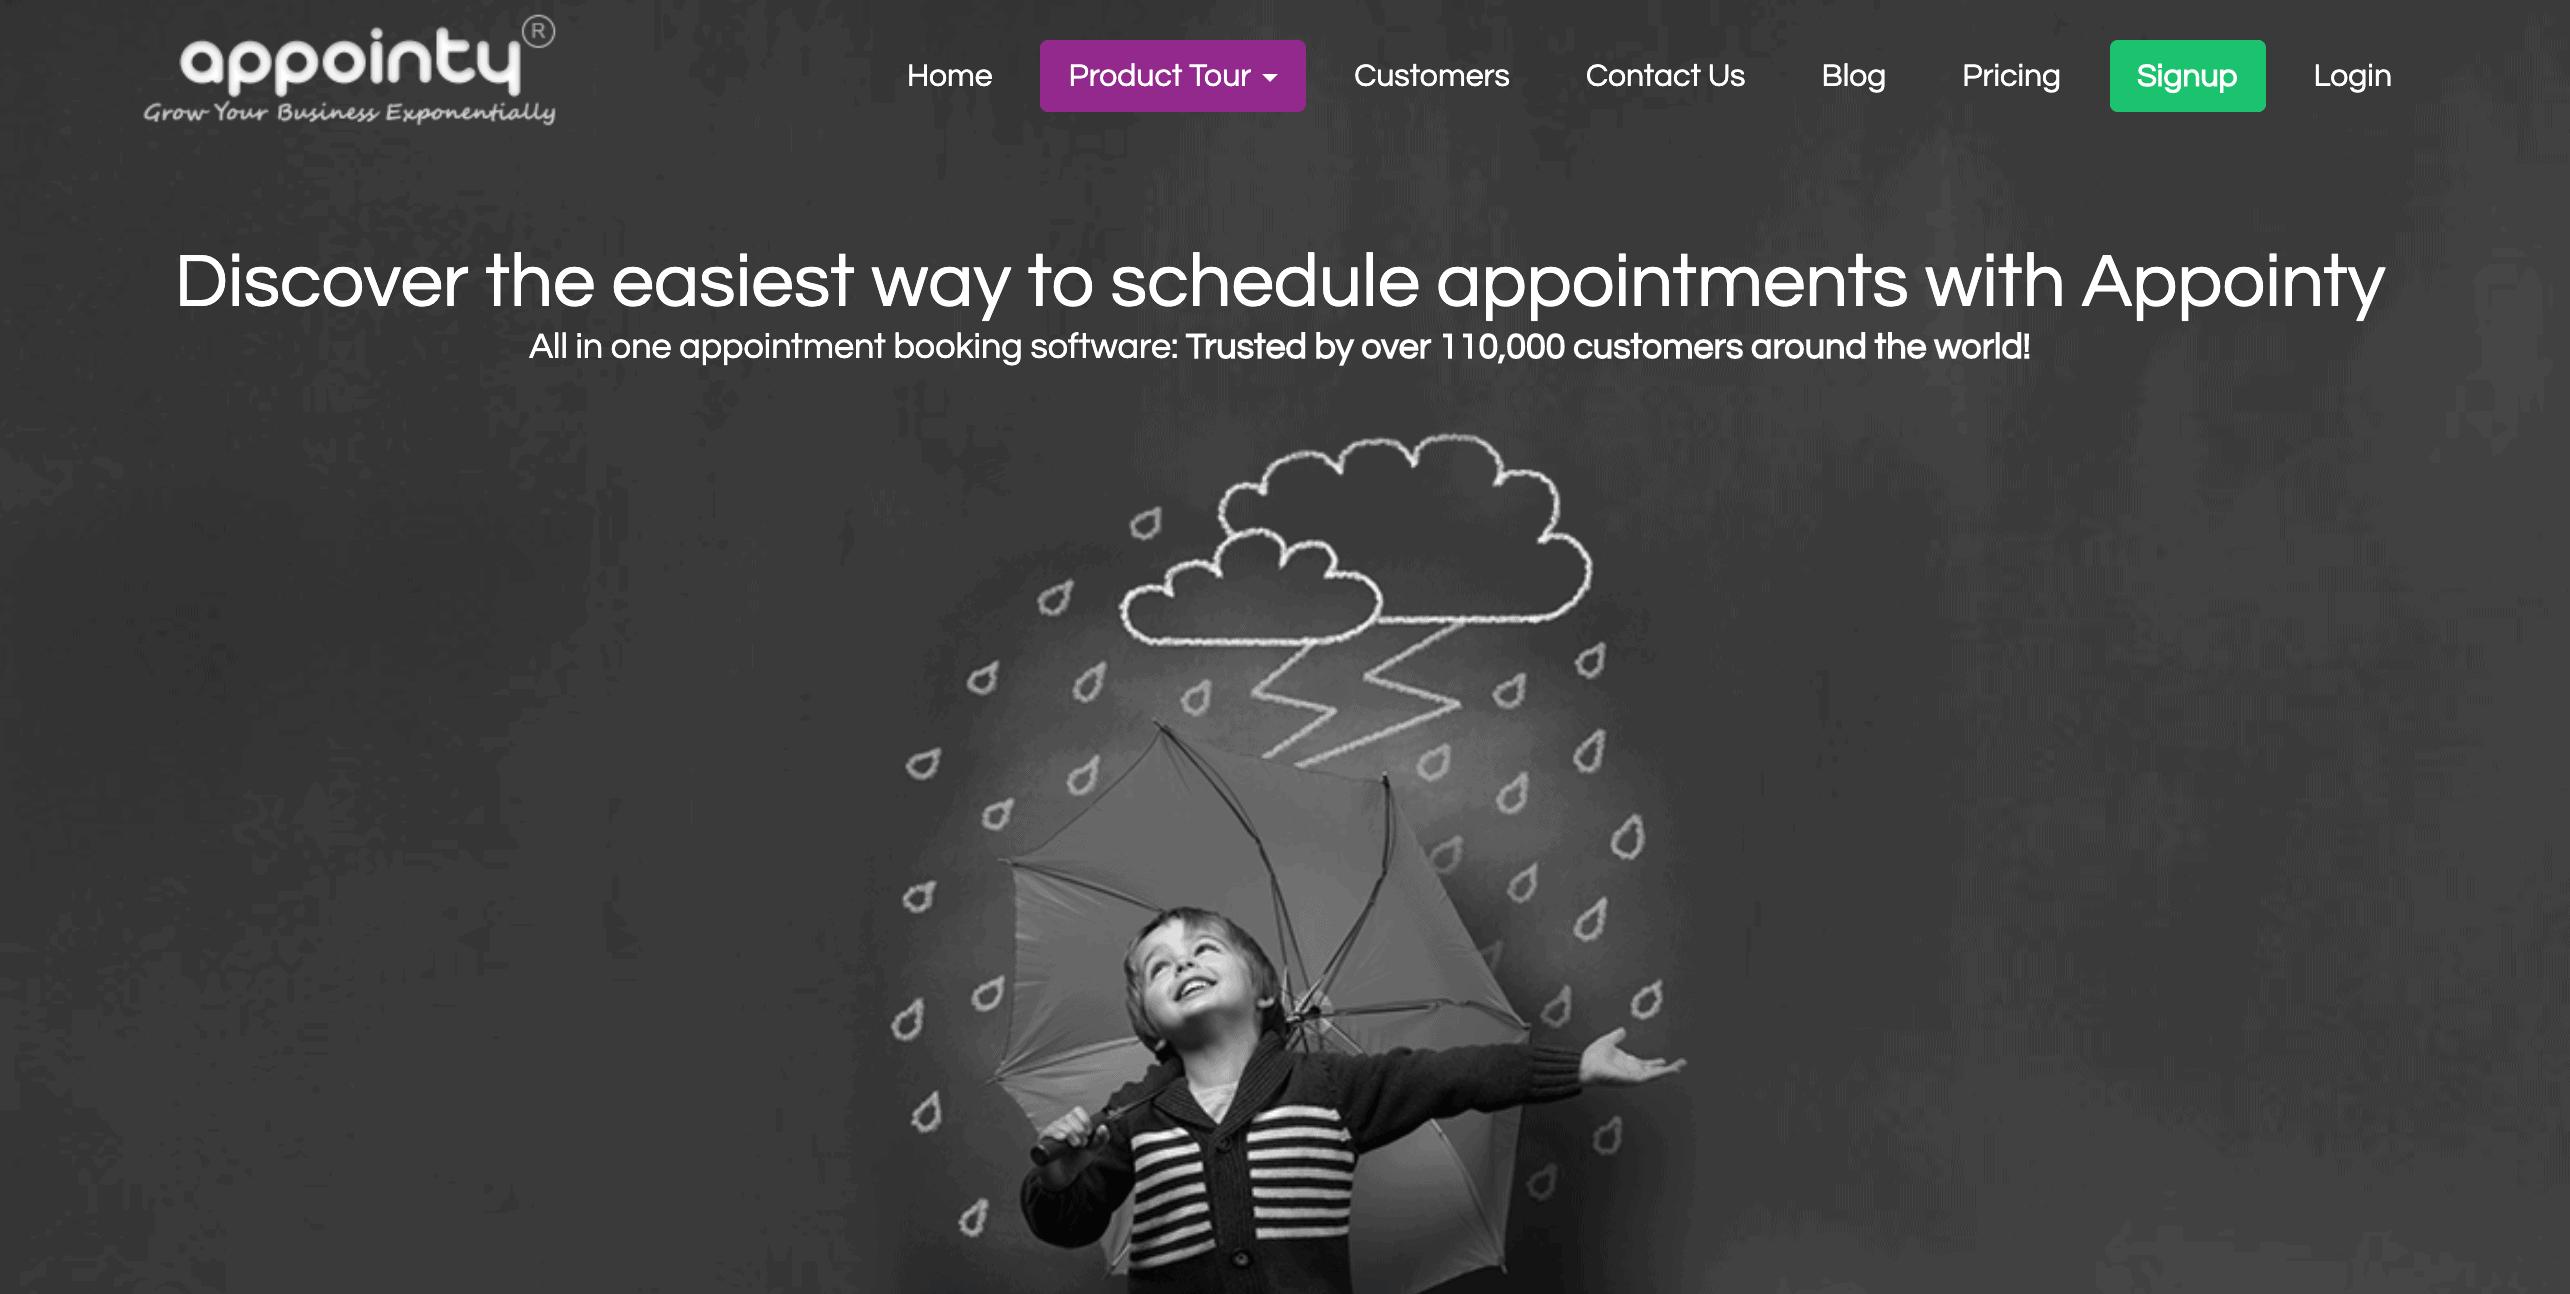 appointy website screenshot